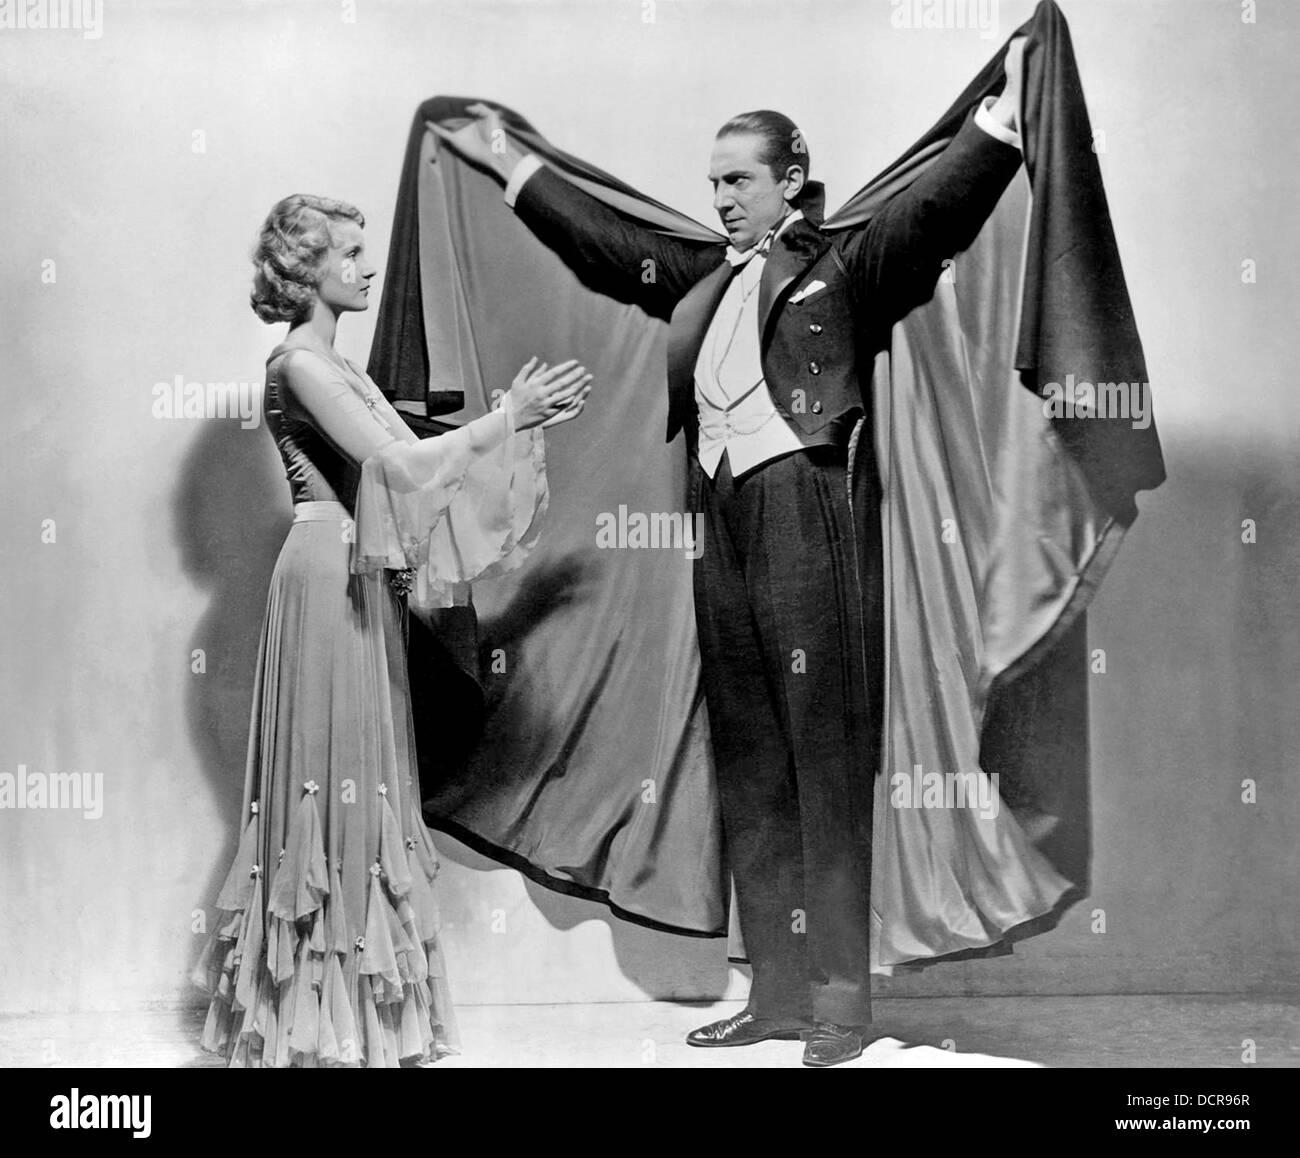 DRACULA 1931 Universal Pictures film con Bela Lugosi e Helen Chandler Immagini Stock